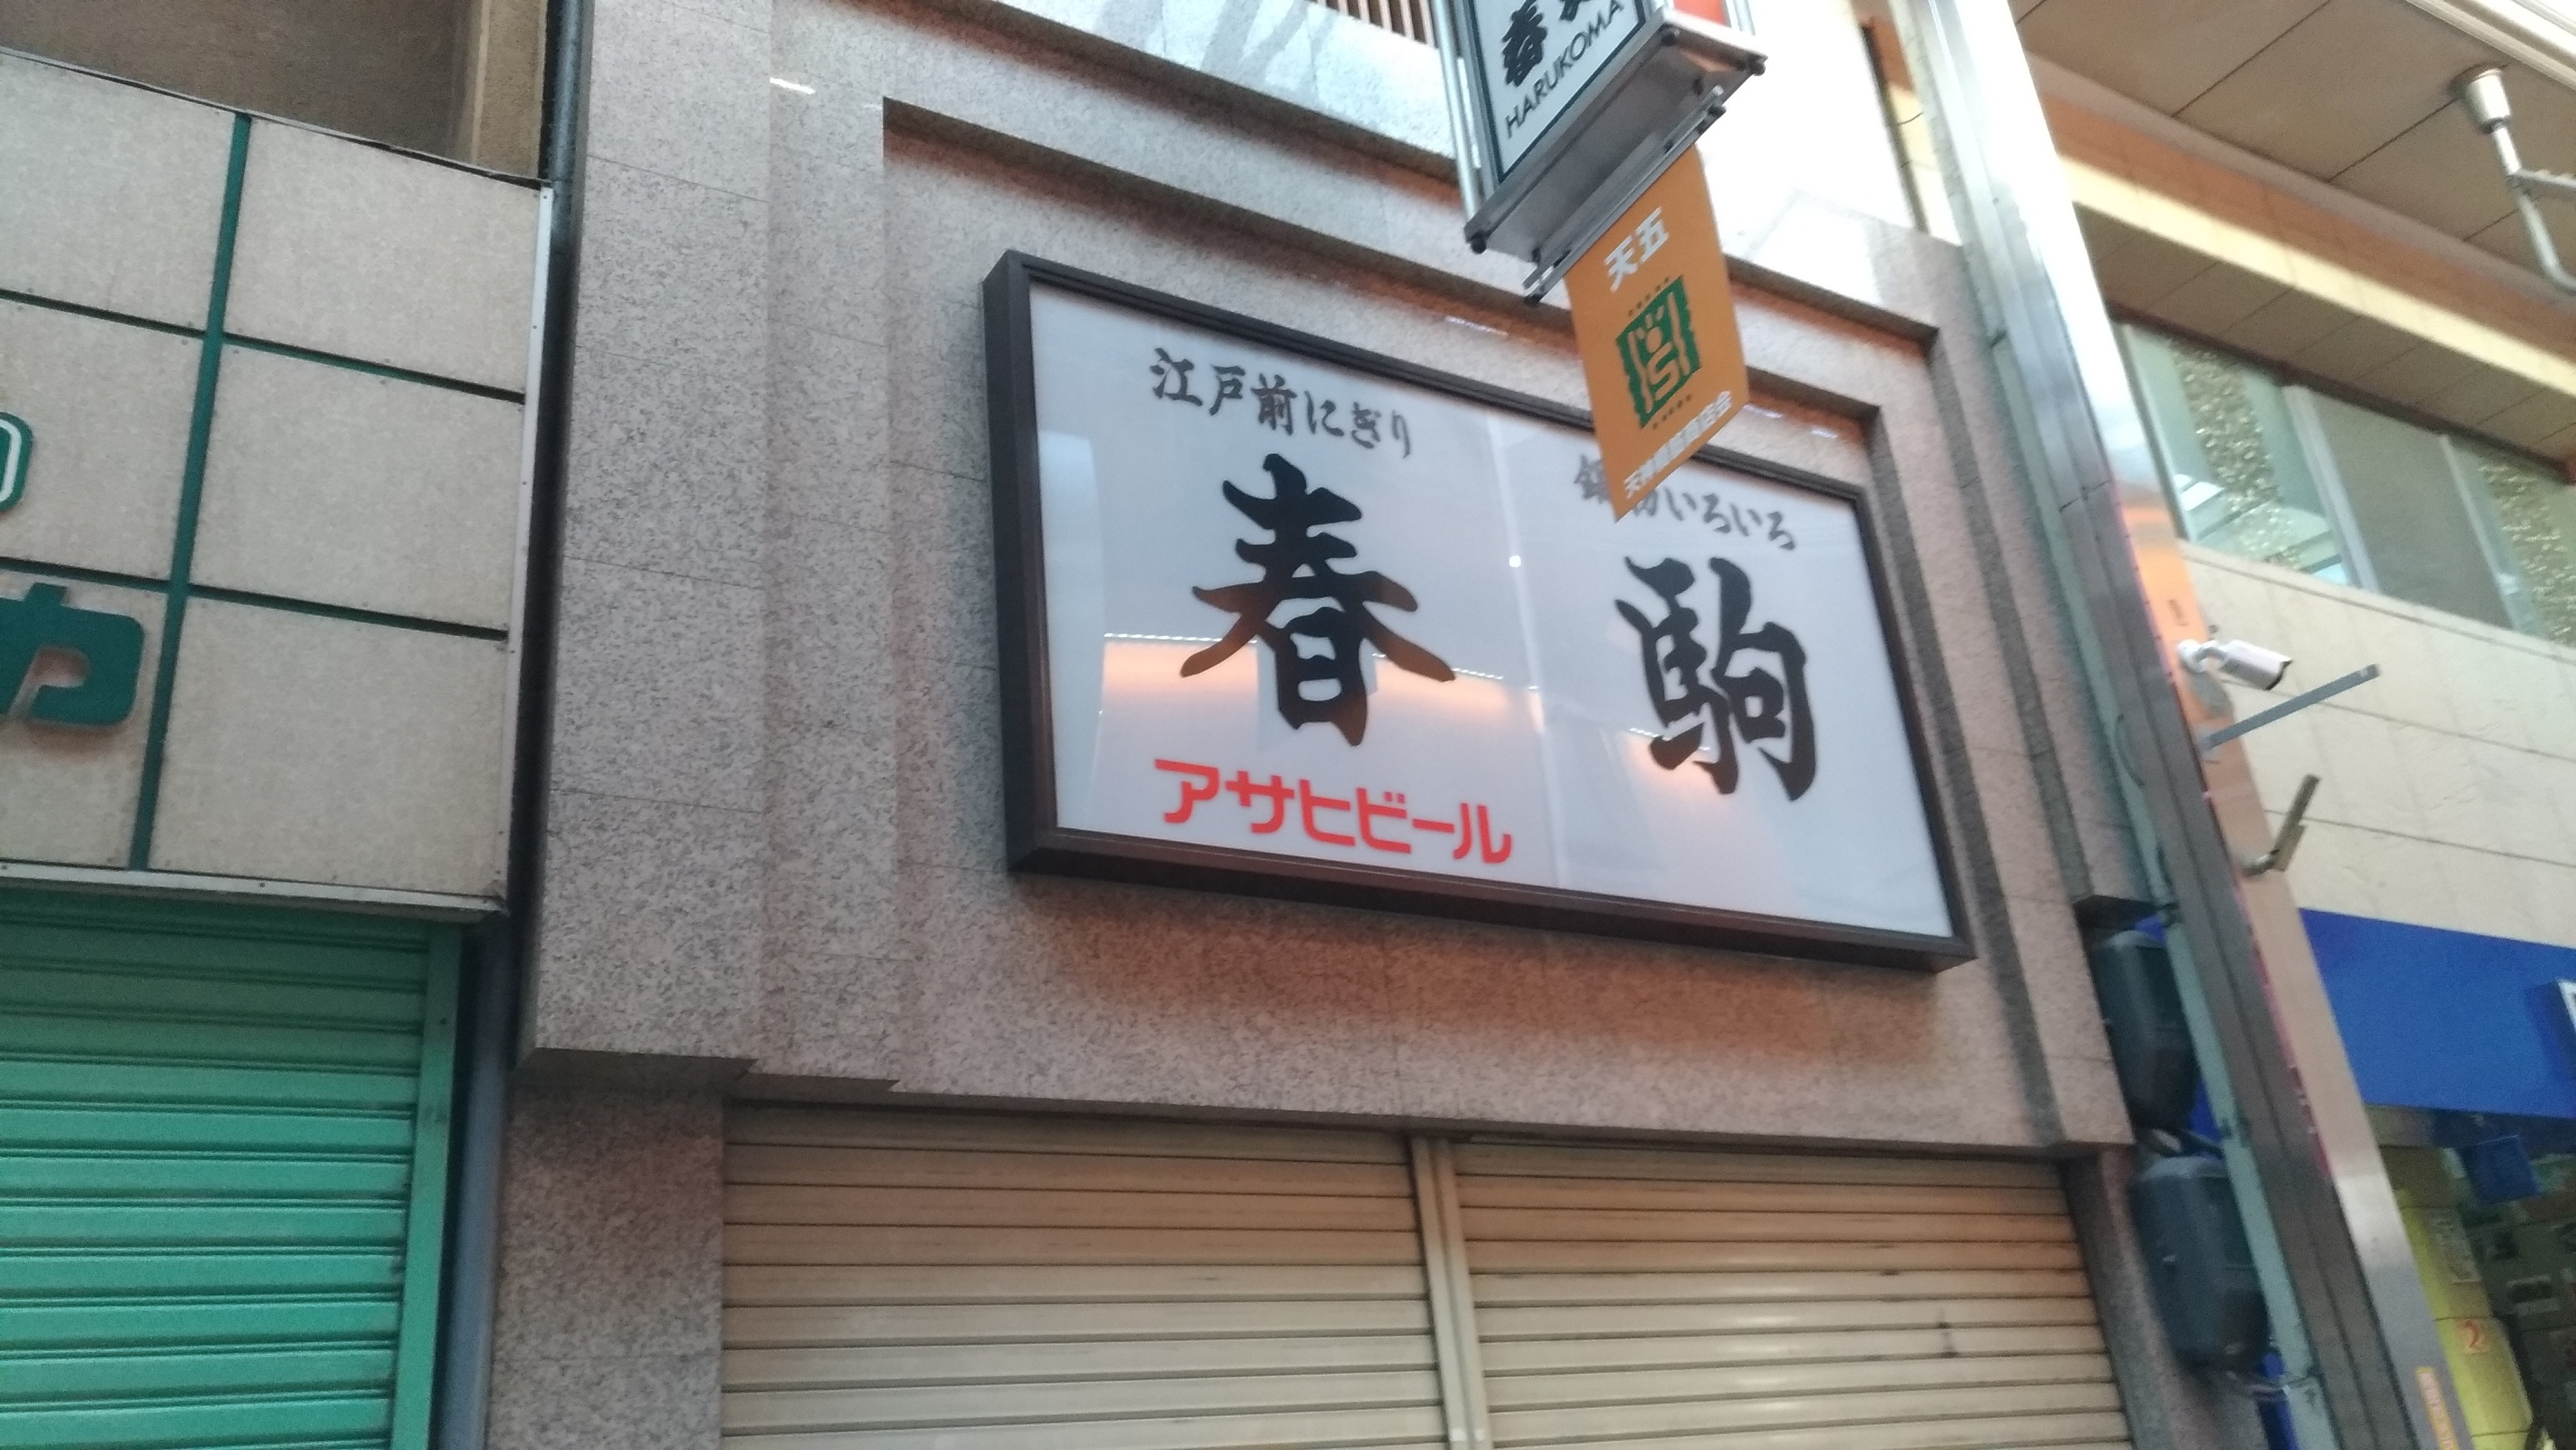 harukoma_sushi_2020_2021_1.jpg